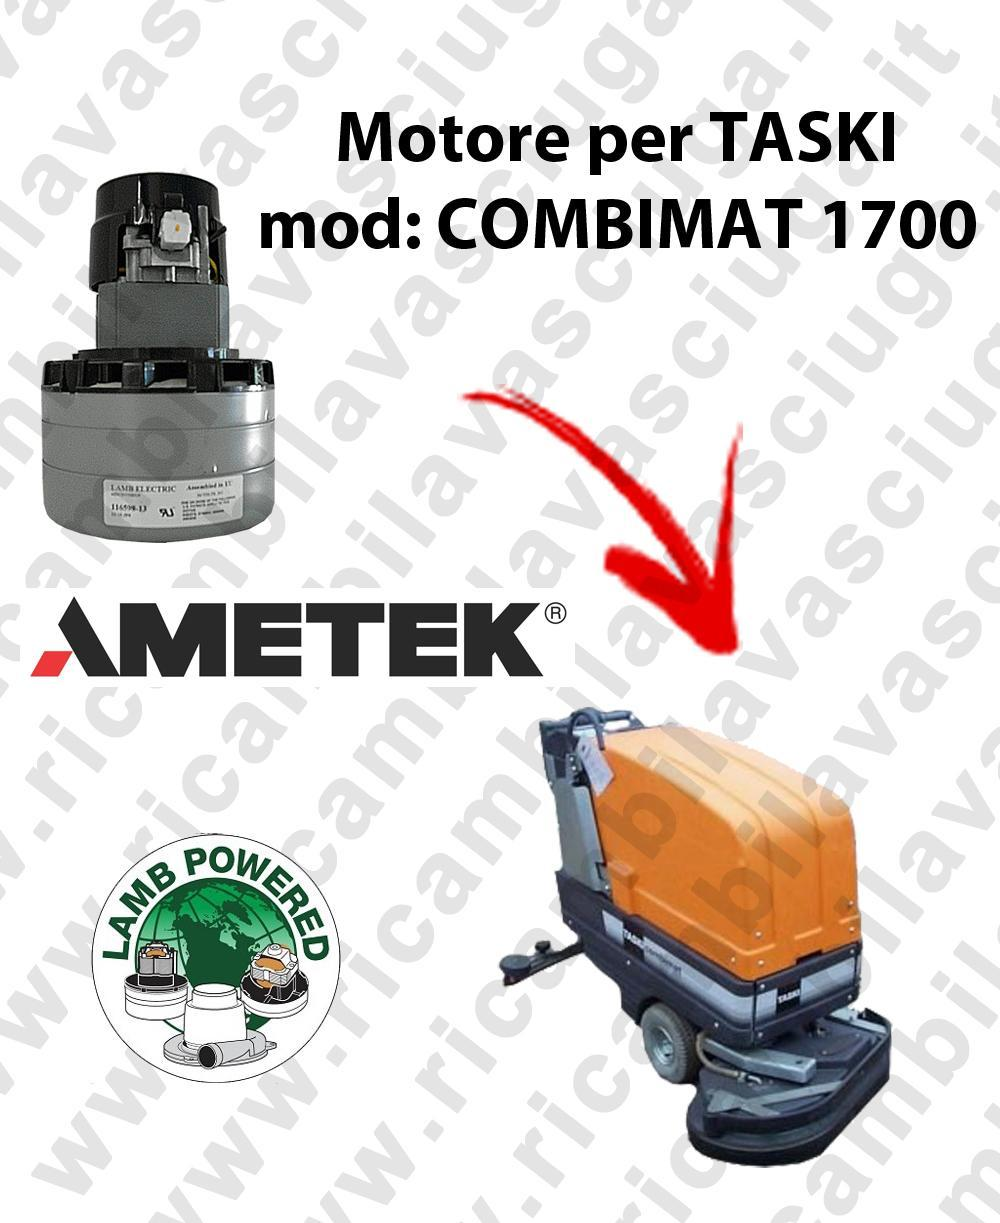 COMBIMAT 1700 Motore de aspiración LAMB AMETEK para fregadora TASKI